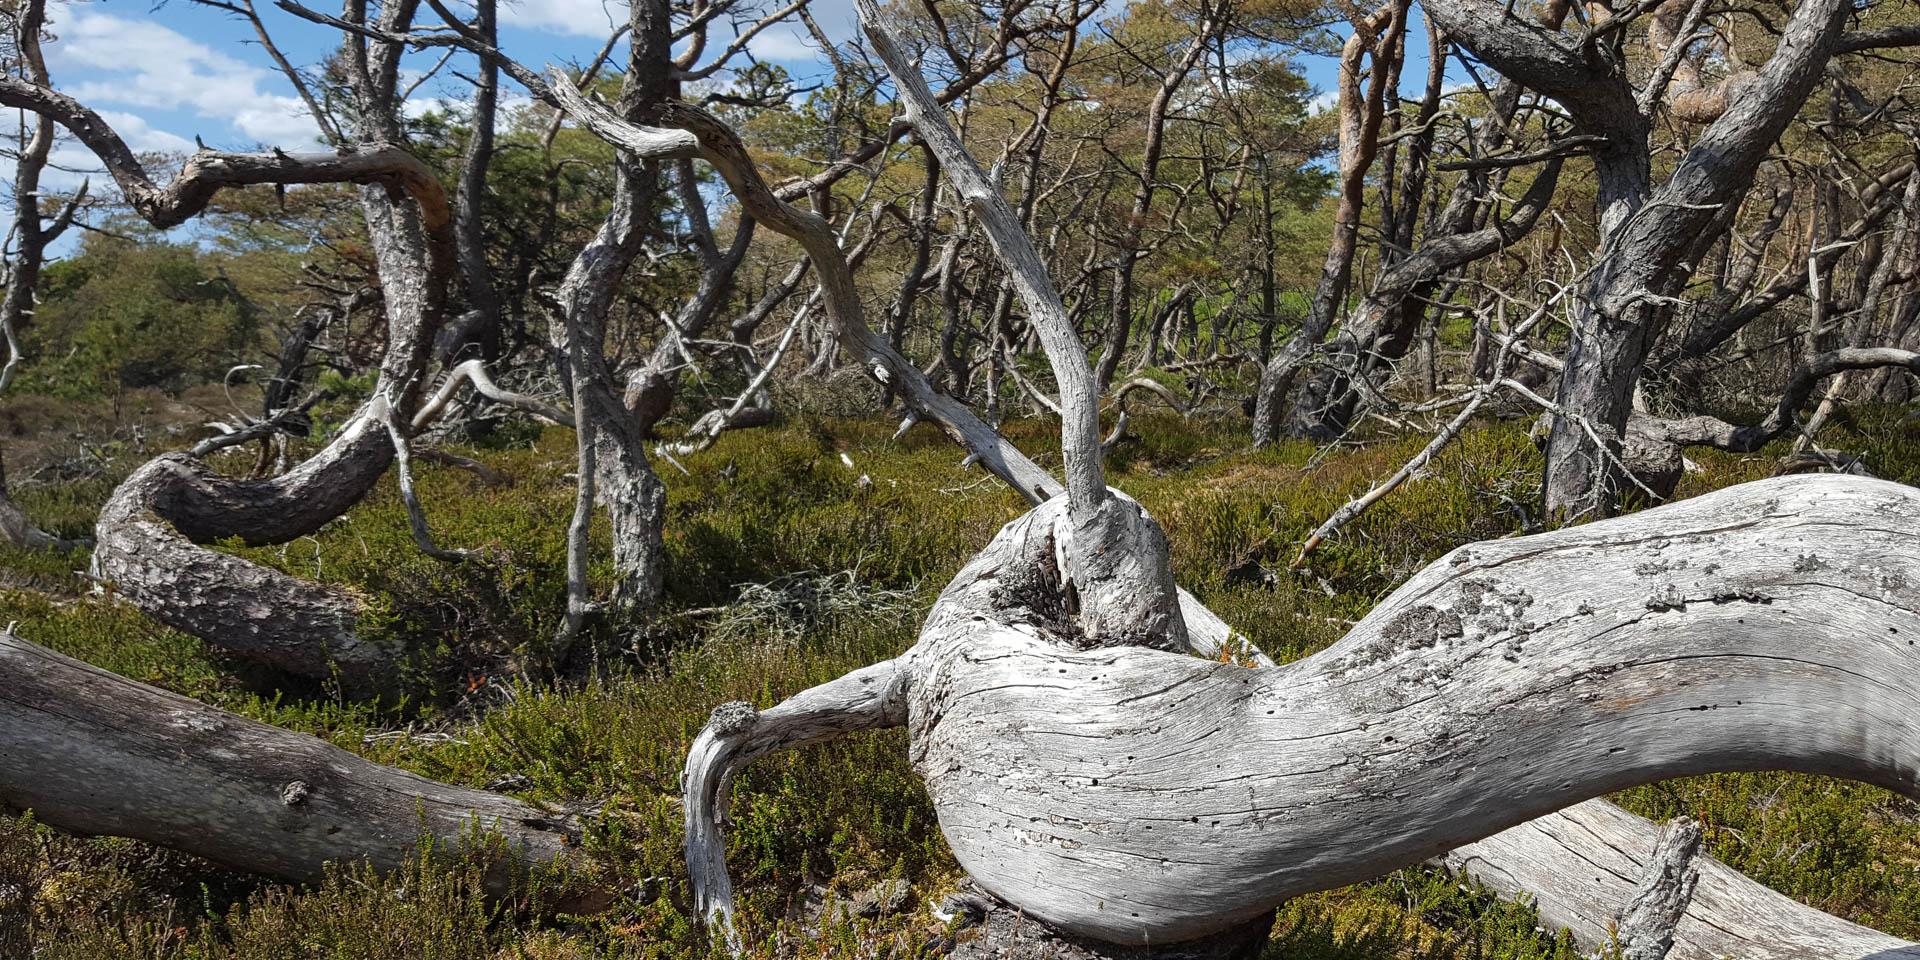 Haverdals Naturreservat 2020